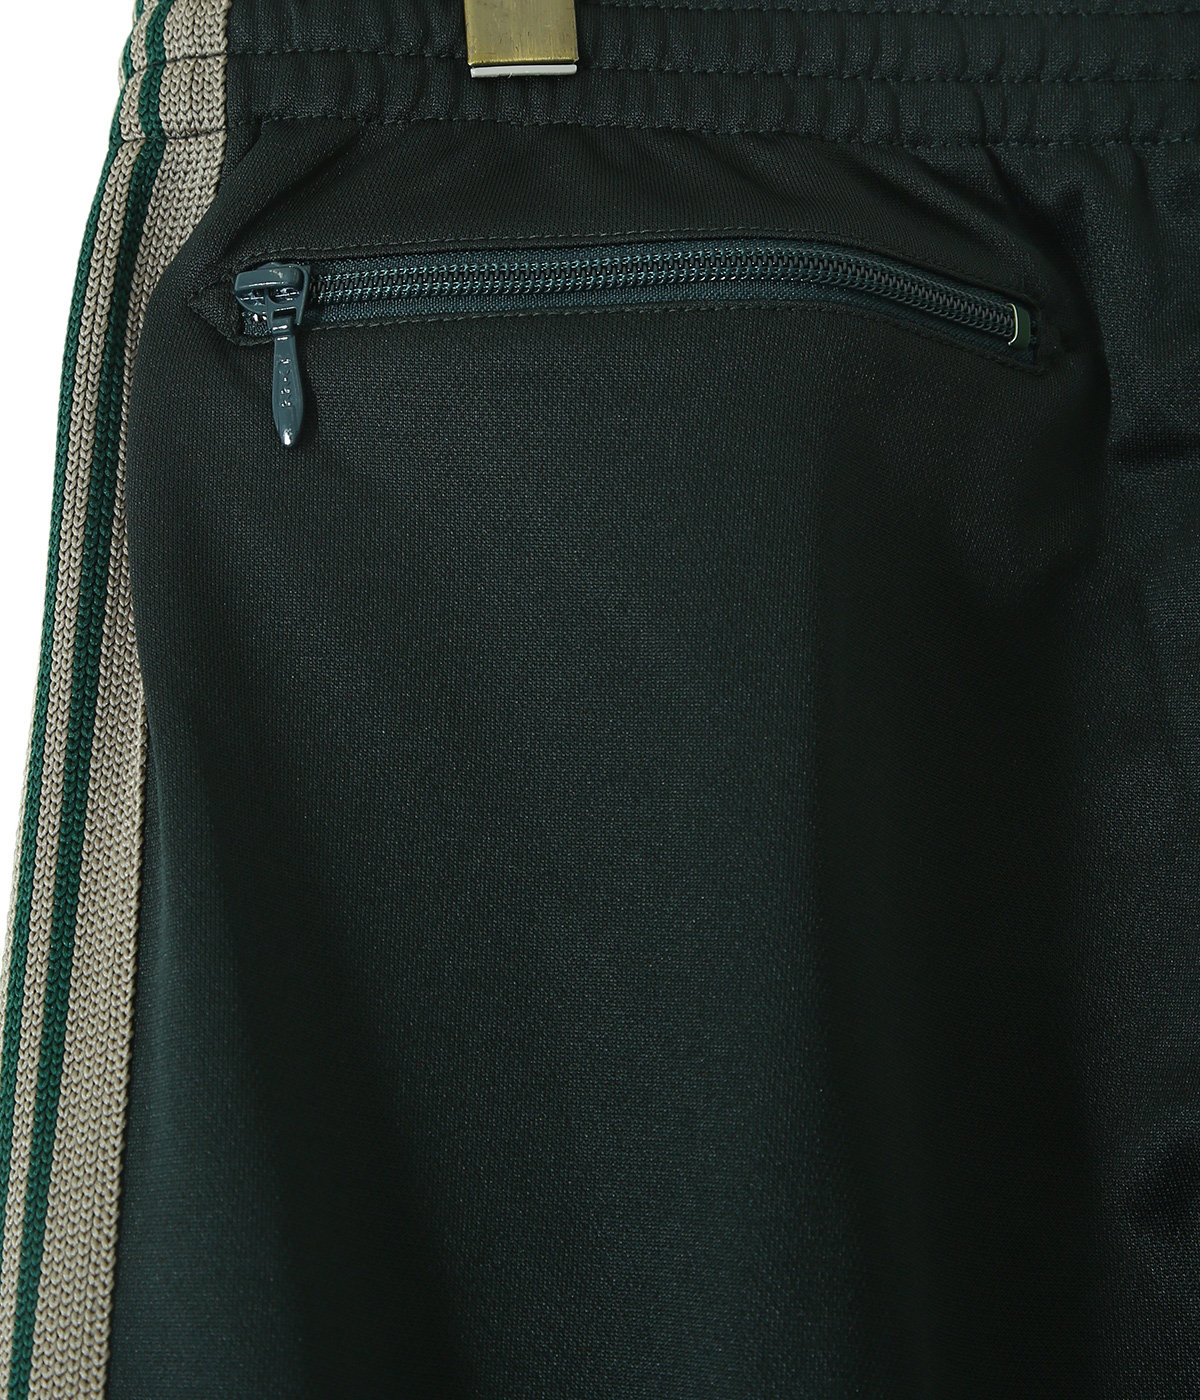 Narrow Track Pant - Poly Smooth